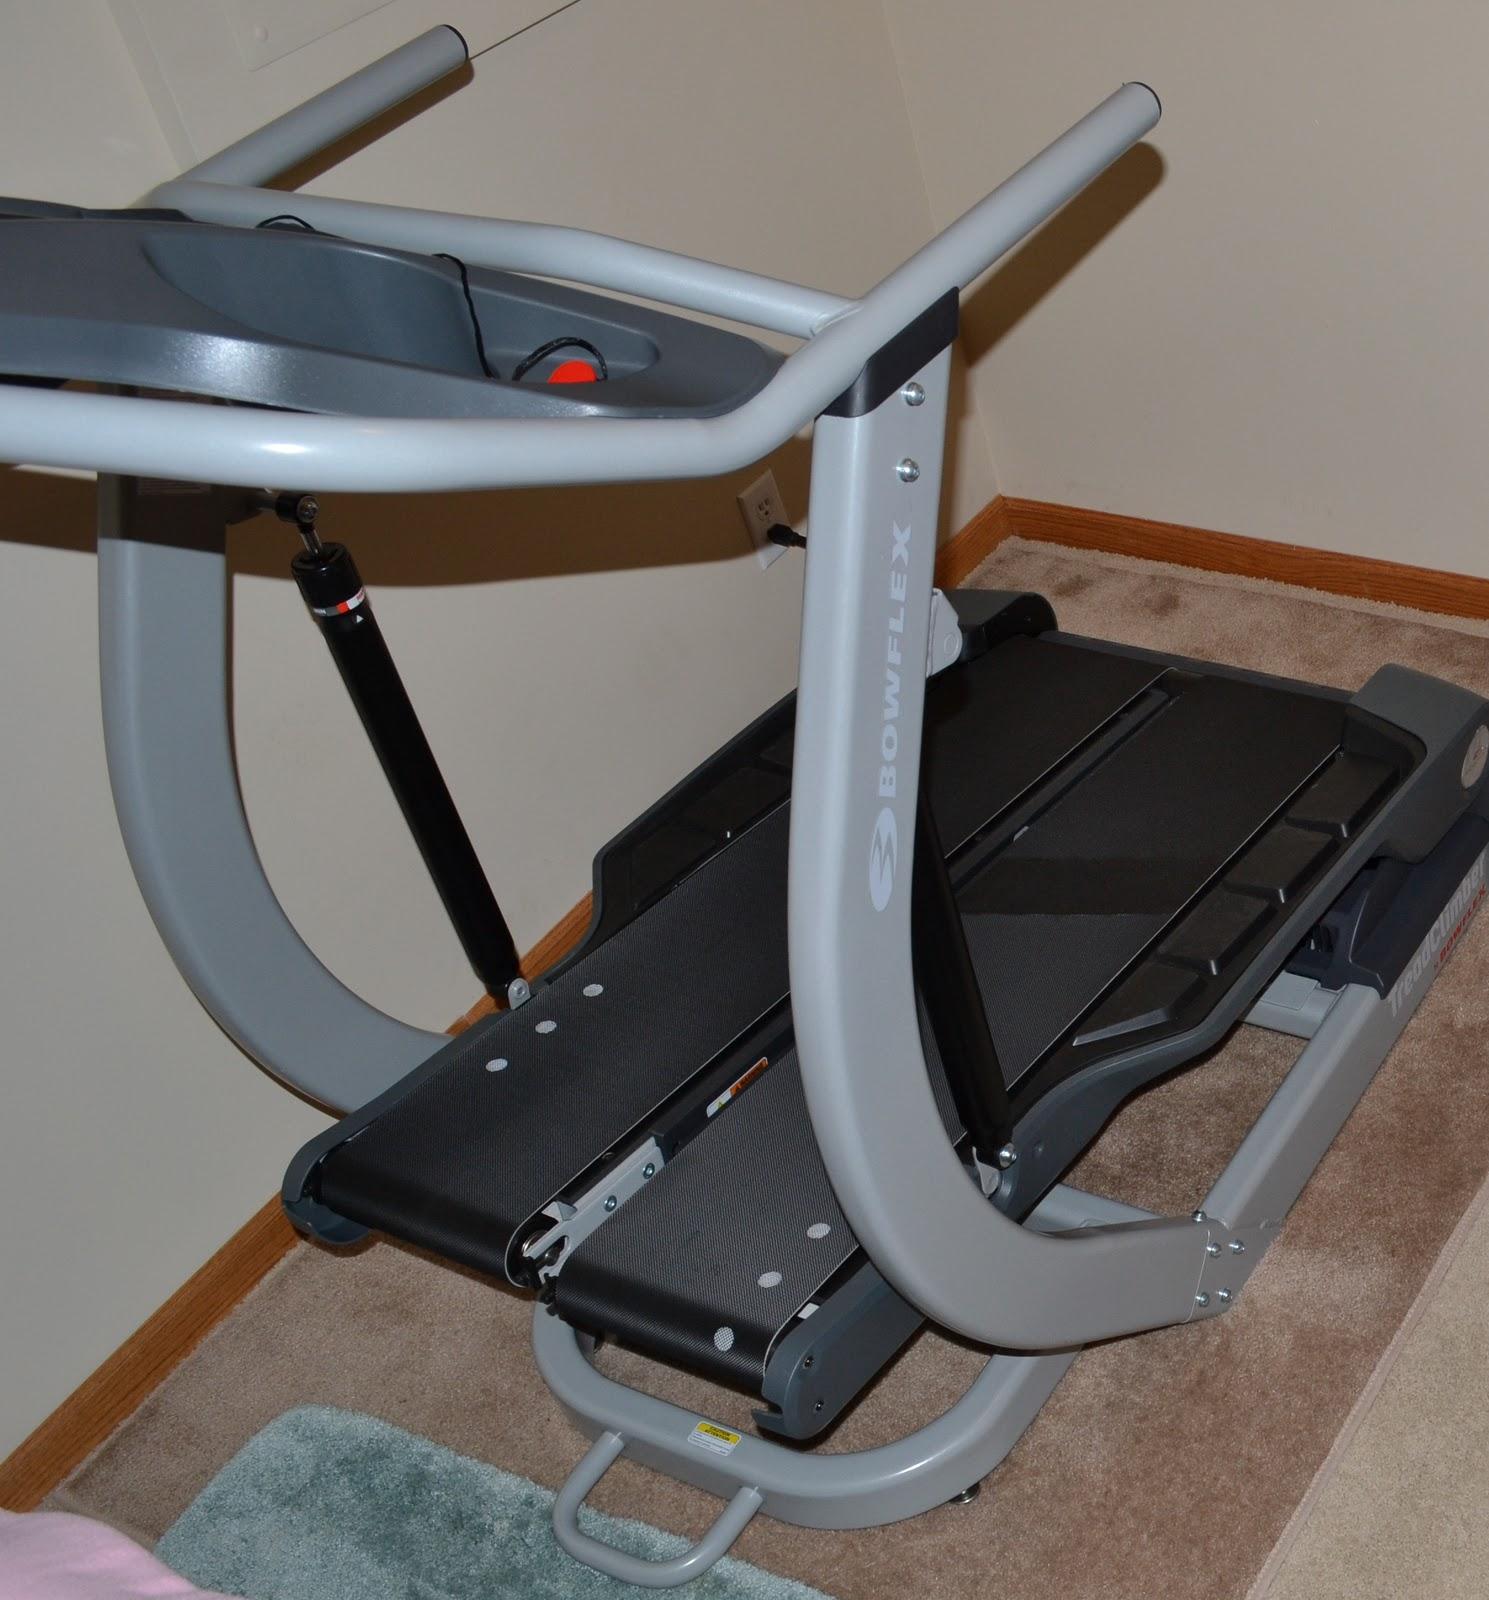 Treadclimber machines treadclimber review diary of a semi health nut